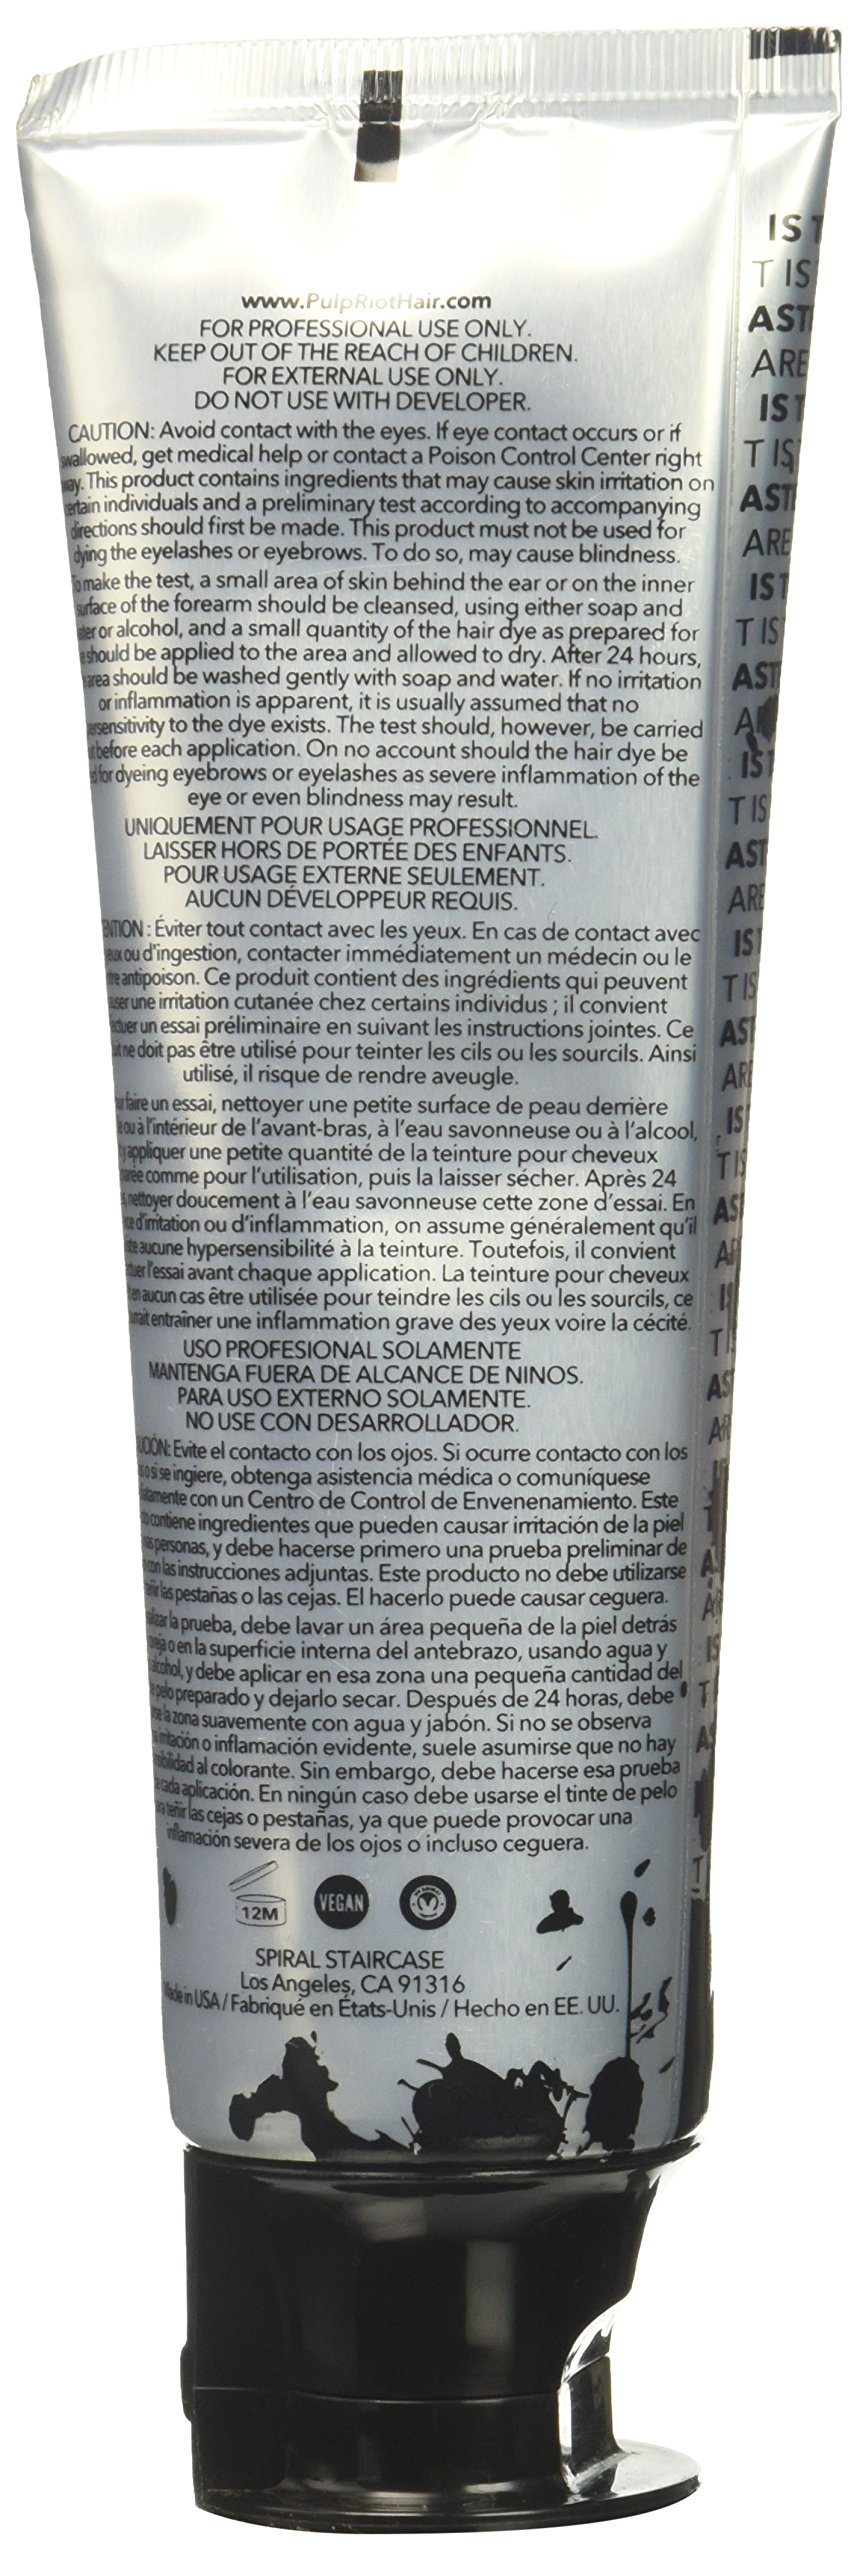 Pulp Riot Semi-Permanent Hair Color for Unisex, Velvet Eggplant, 4 Ounce by Pulp Riot (Image #5)